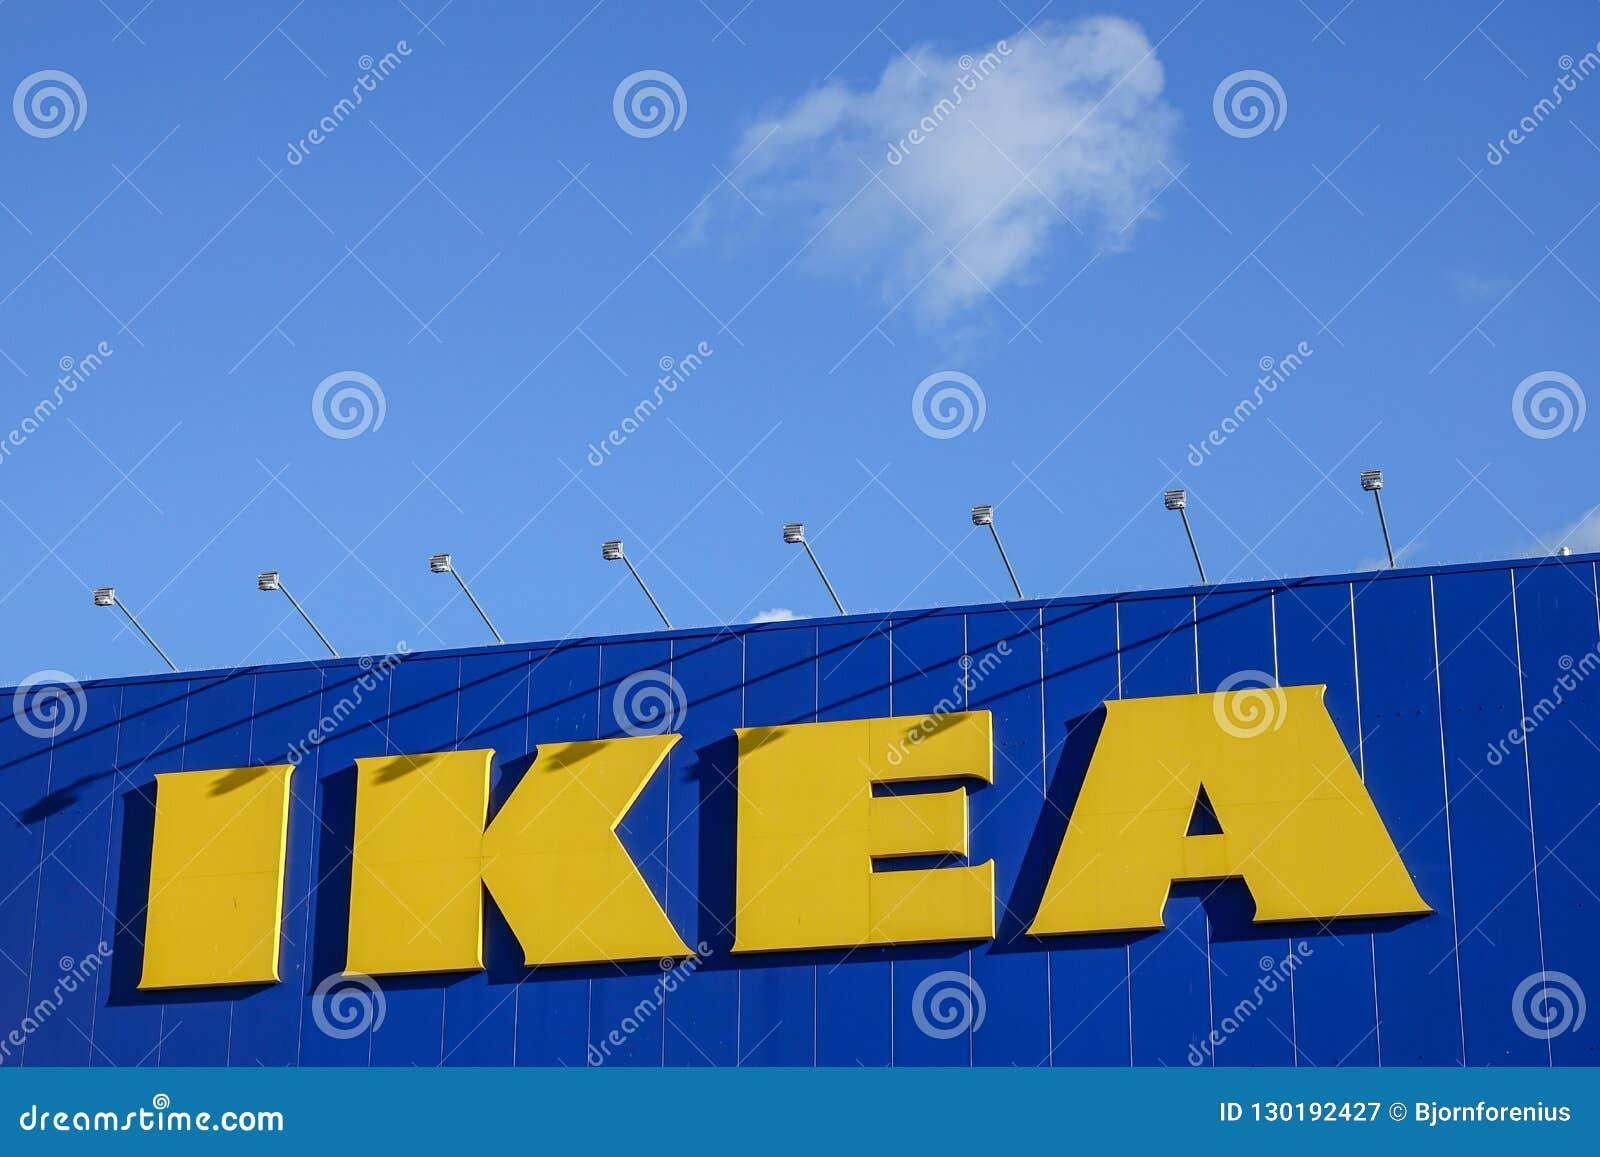 Ikea Swedish Furniture Store Editorial Photography Image Of